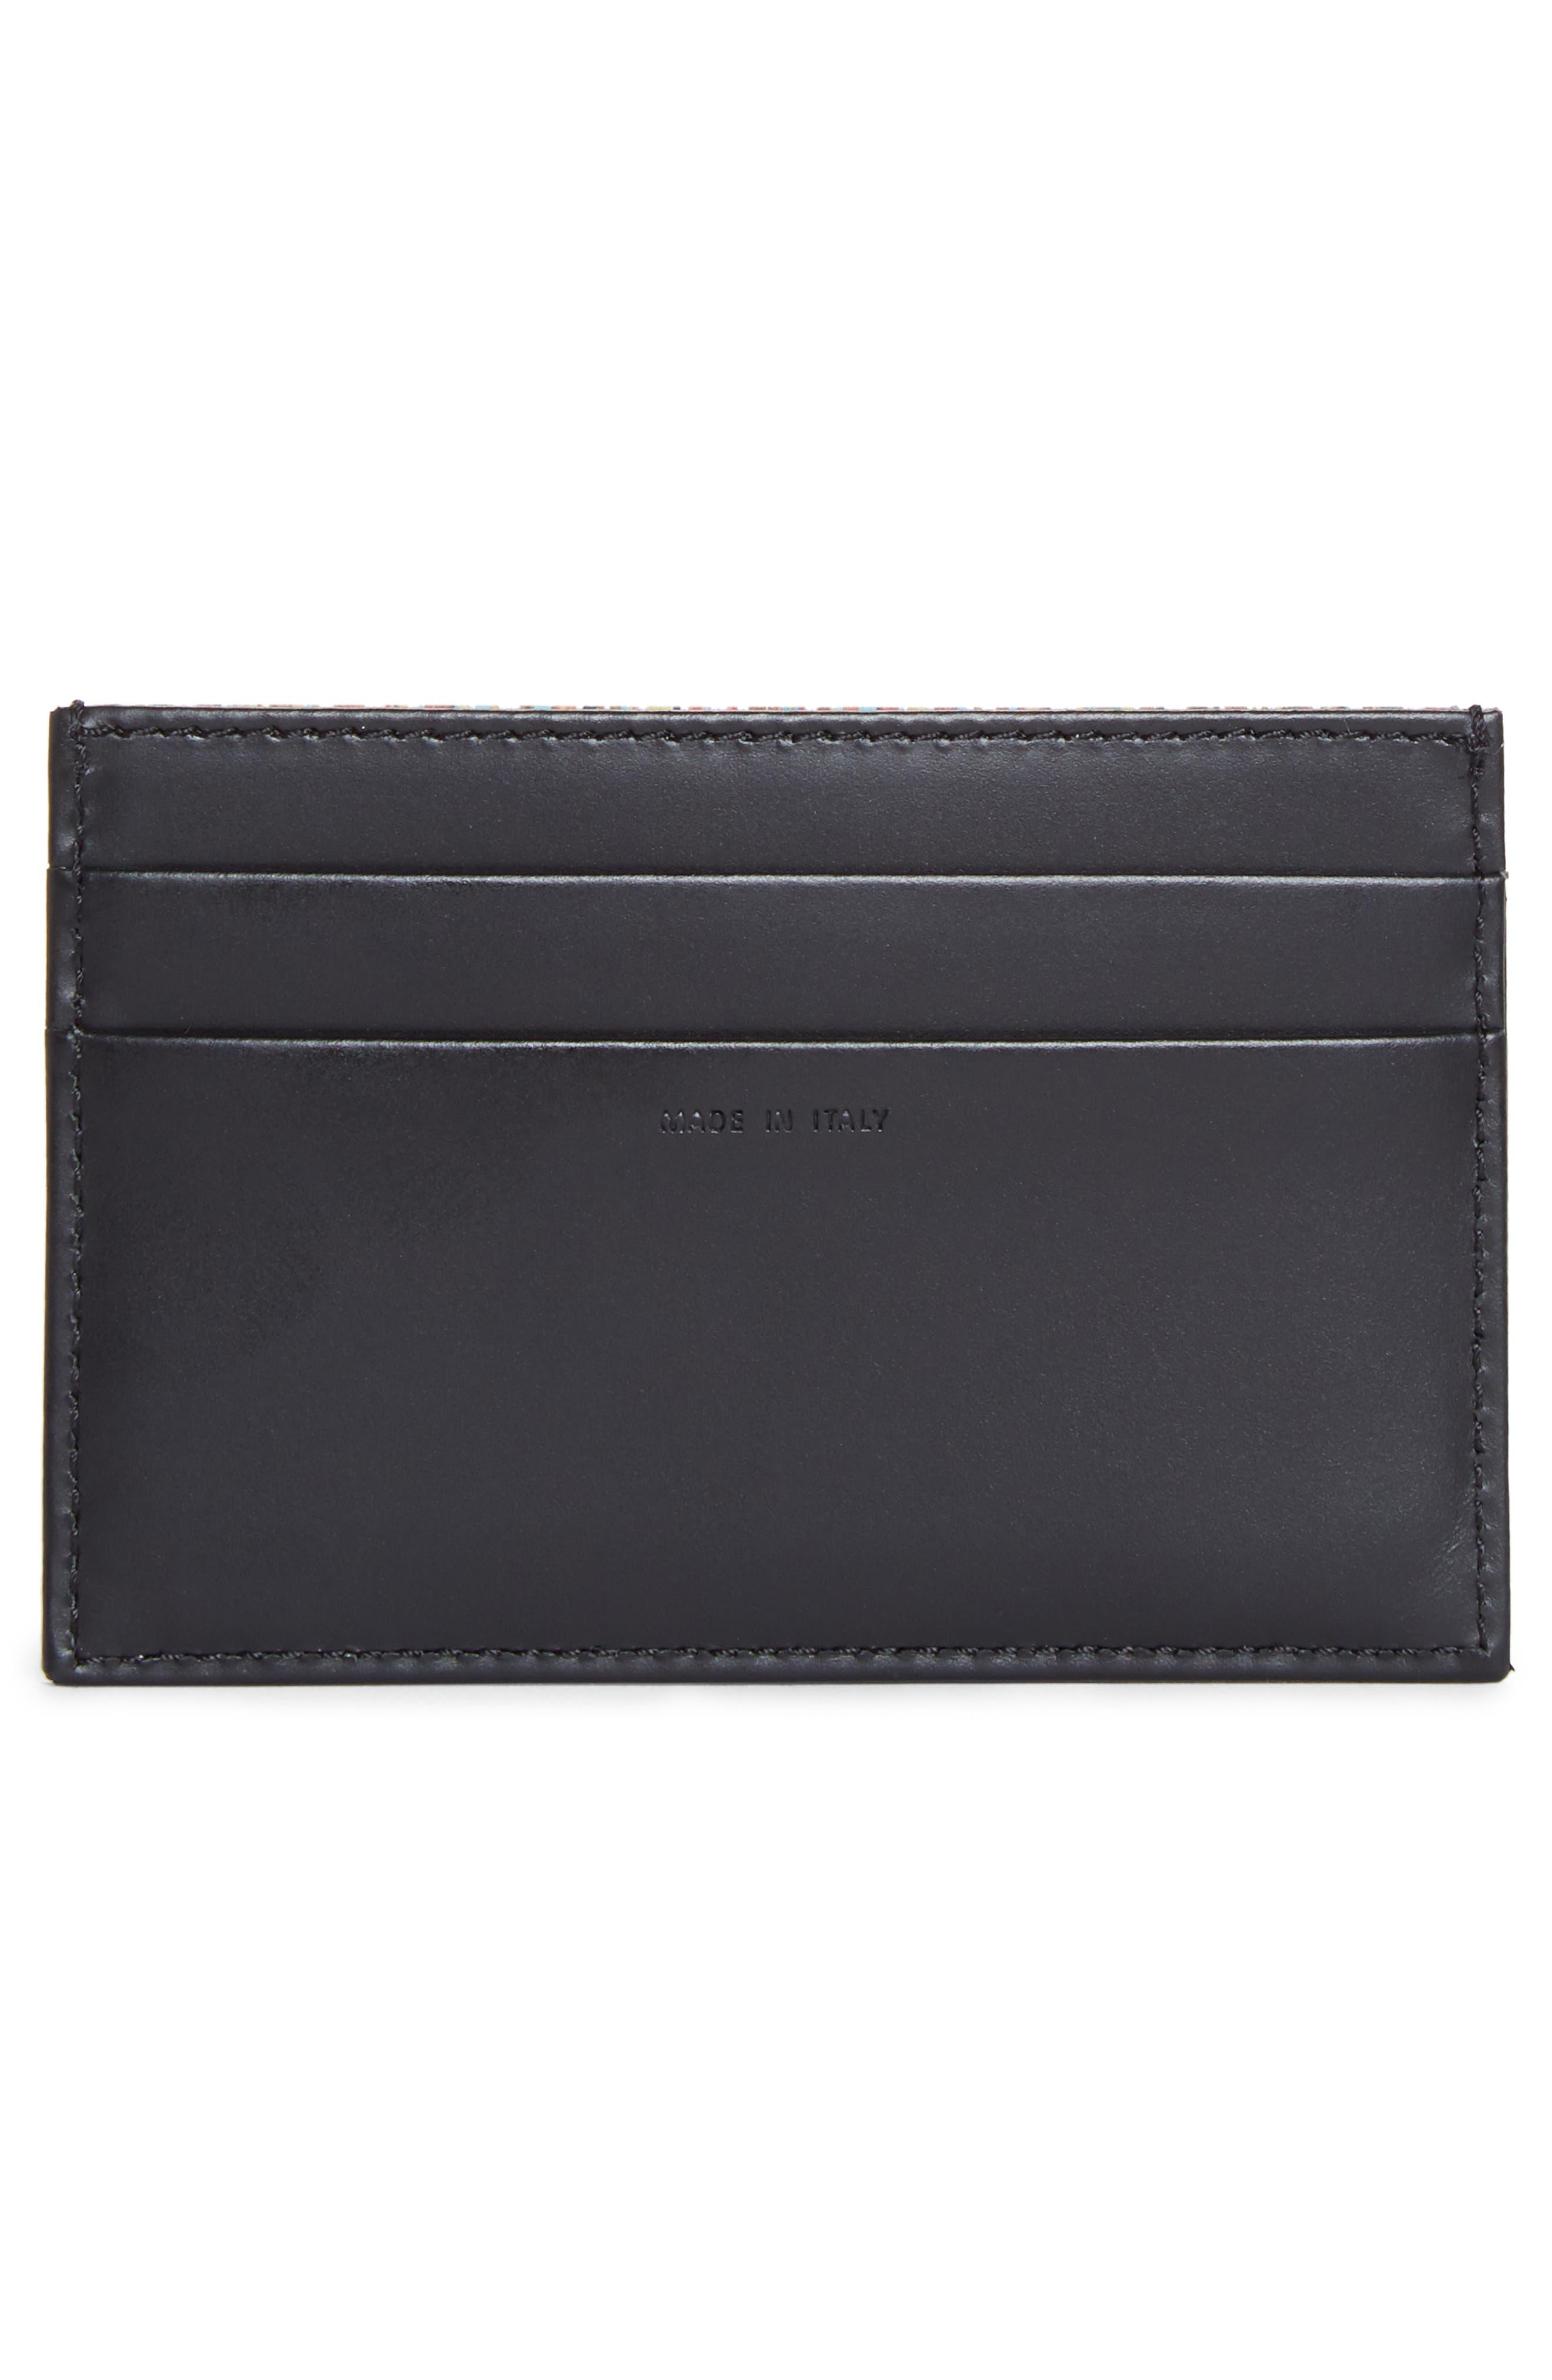 Multistripe Leather Card Case,                             Alternate thumbnail 2, color,                             BLACK